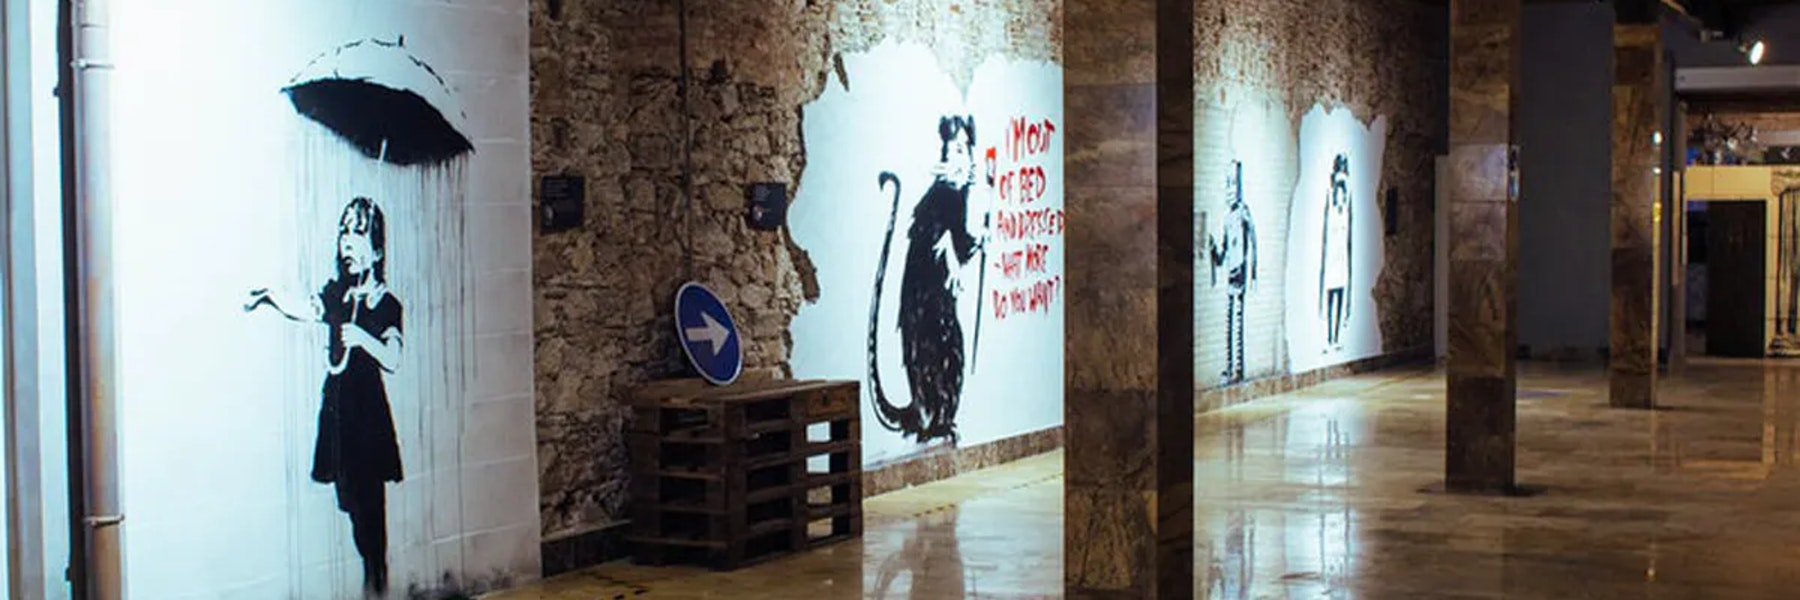 World of Banksy